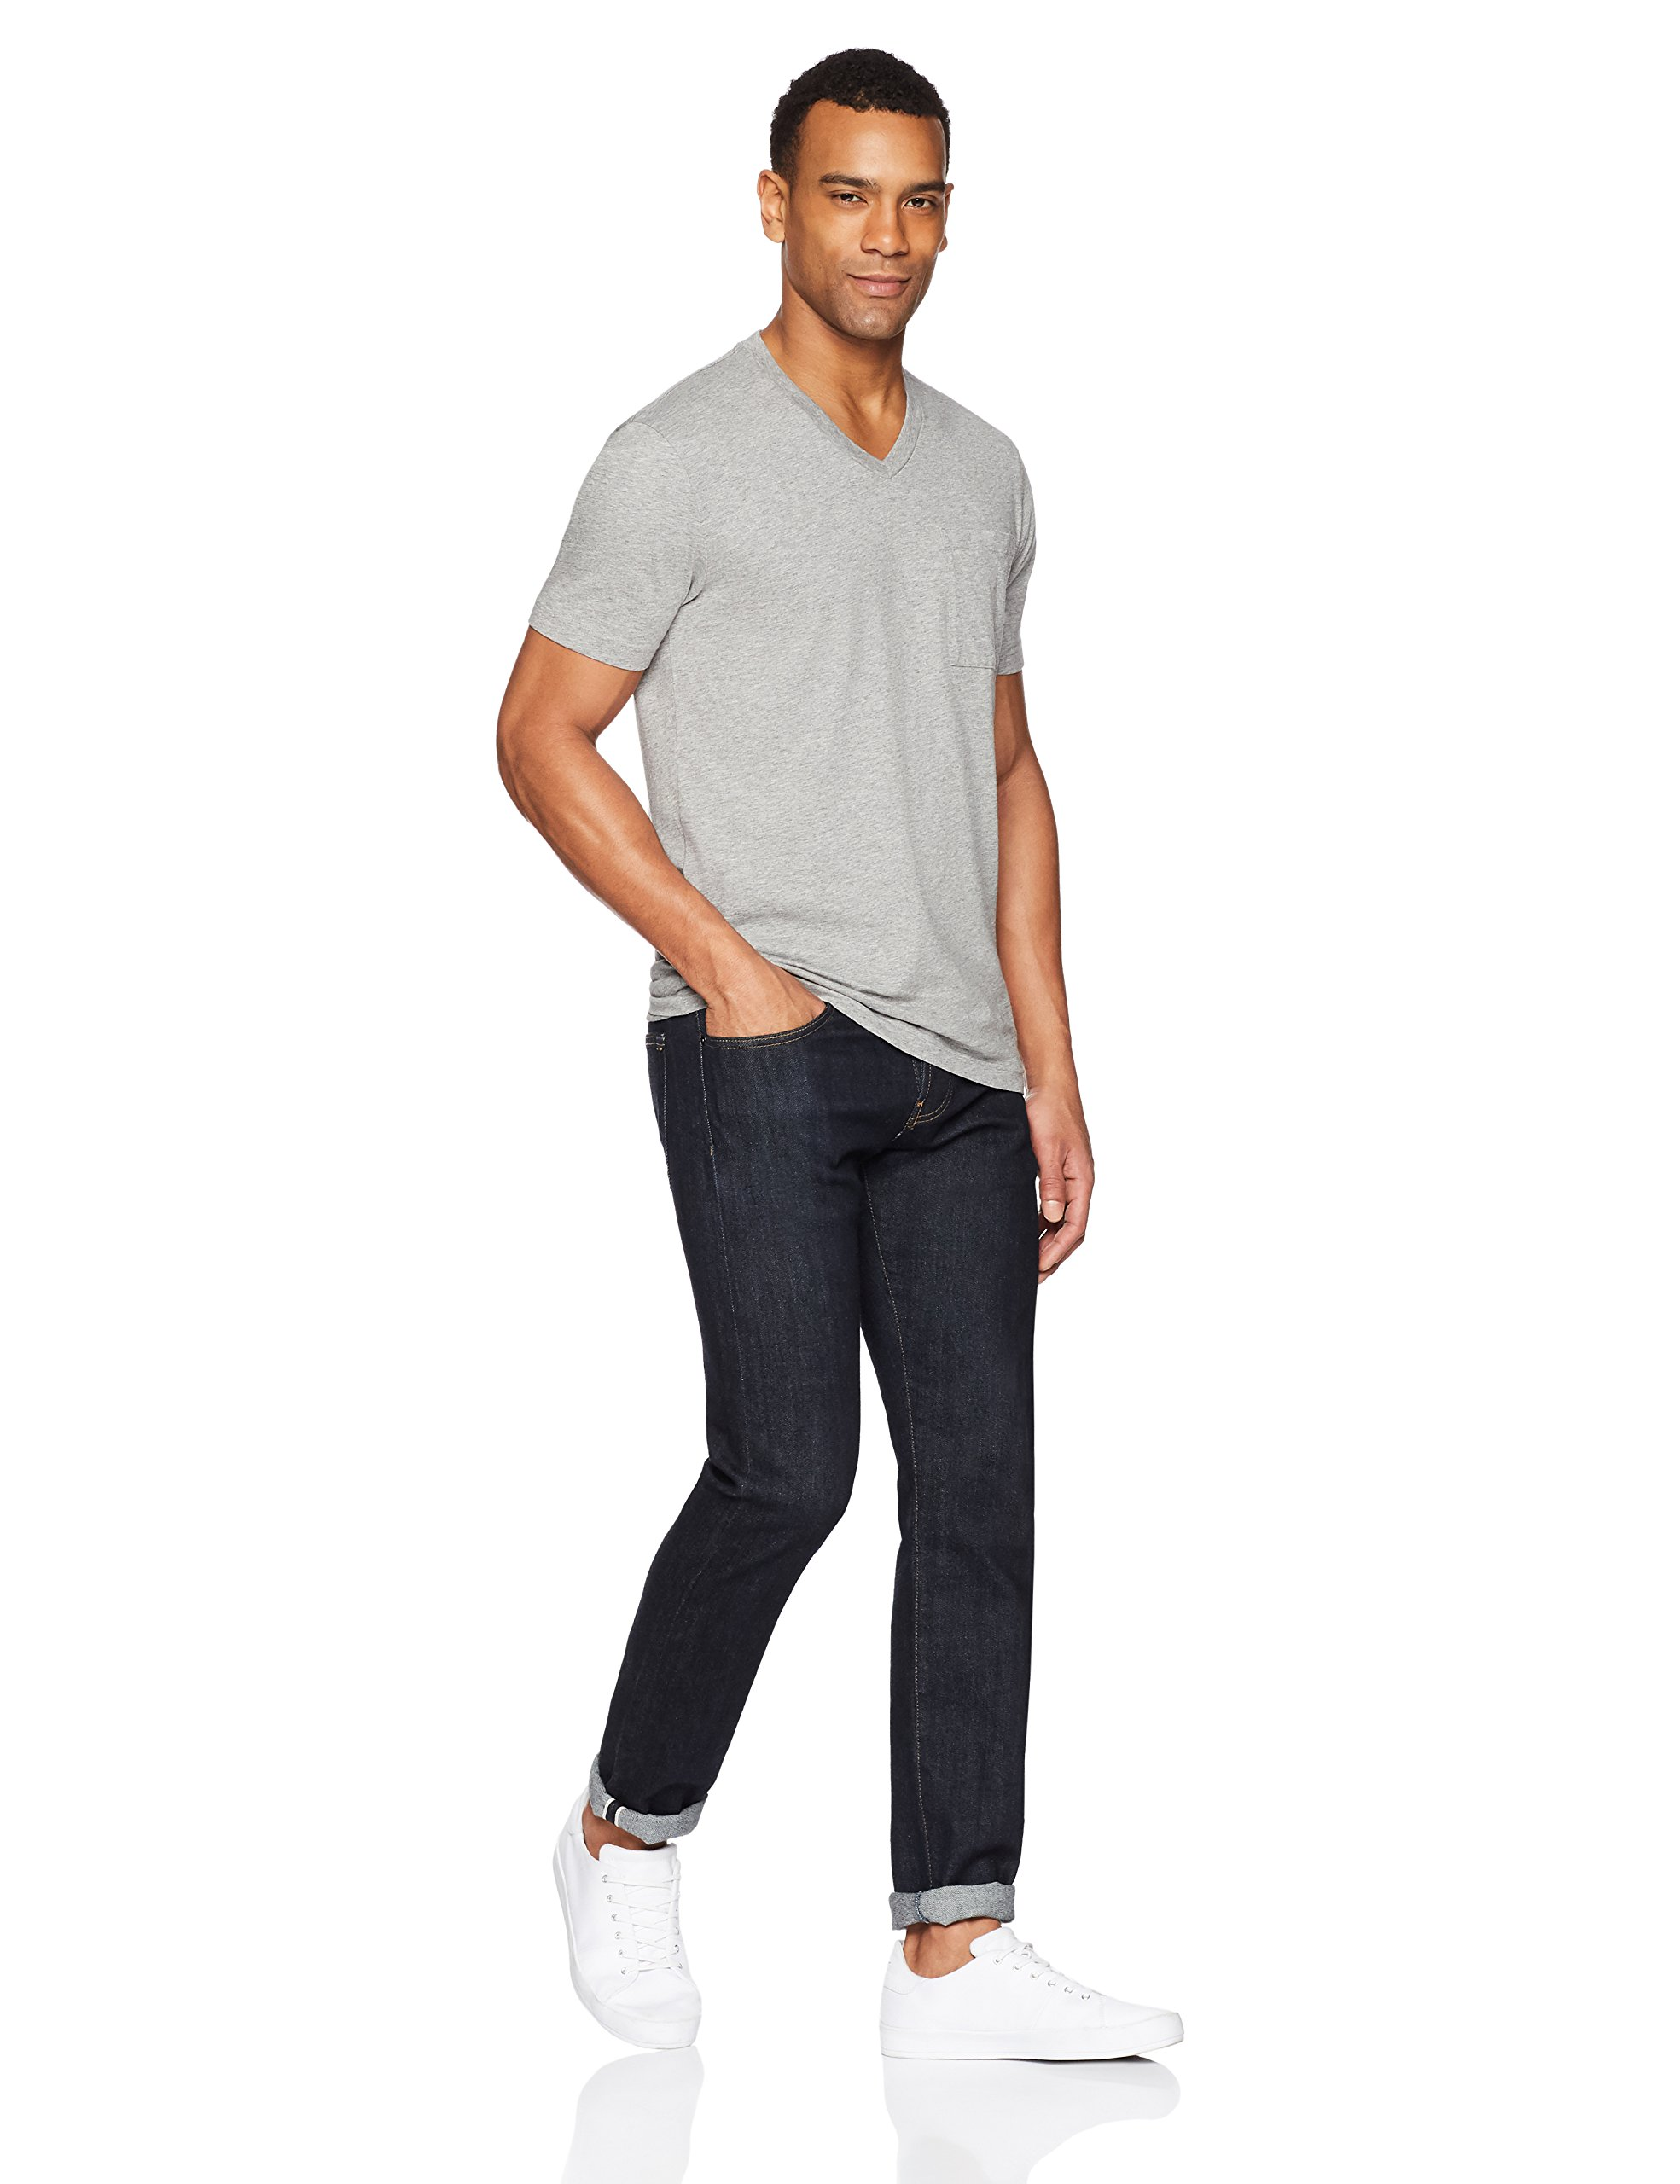 Goodthreads Men's Short-Sleeve V-Neck Cotton T-Shirt, Heather Grey, X-Large by Goodthreads (Image #2)